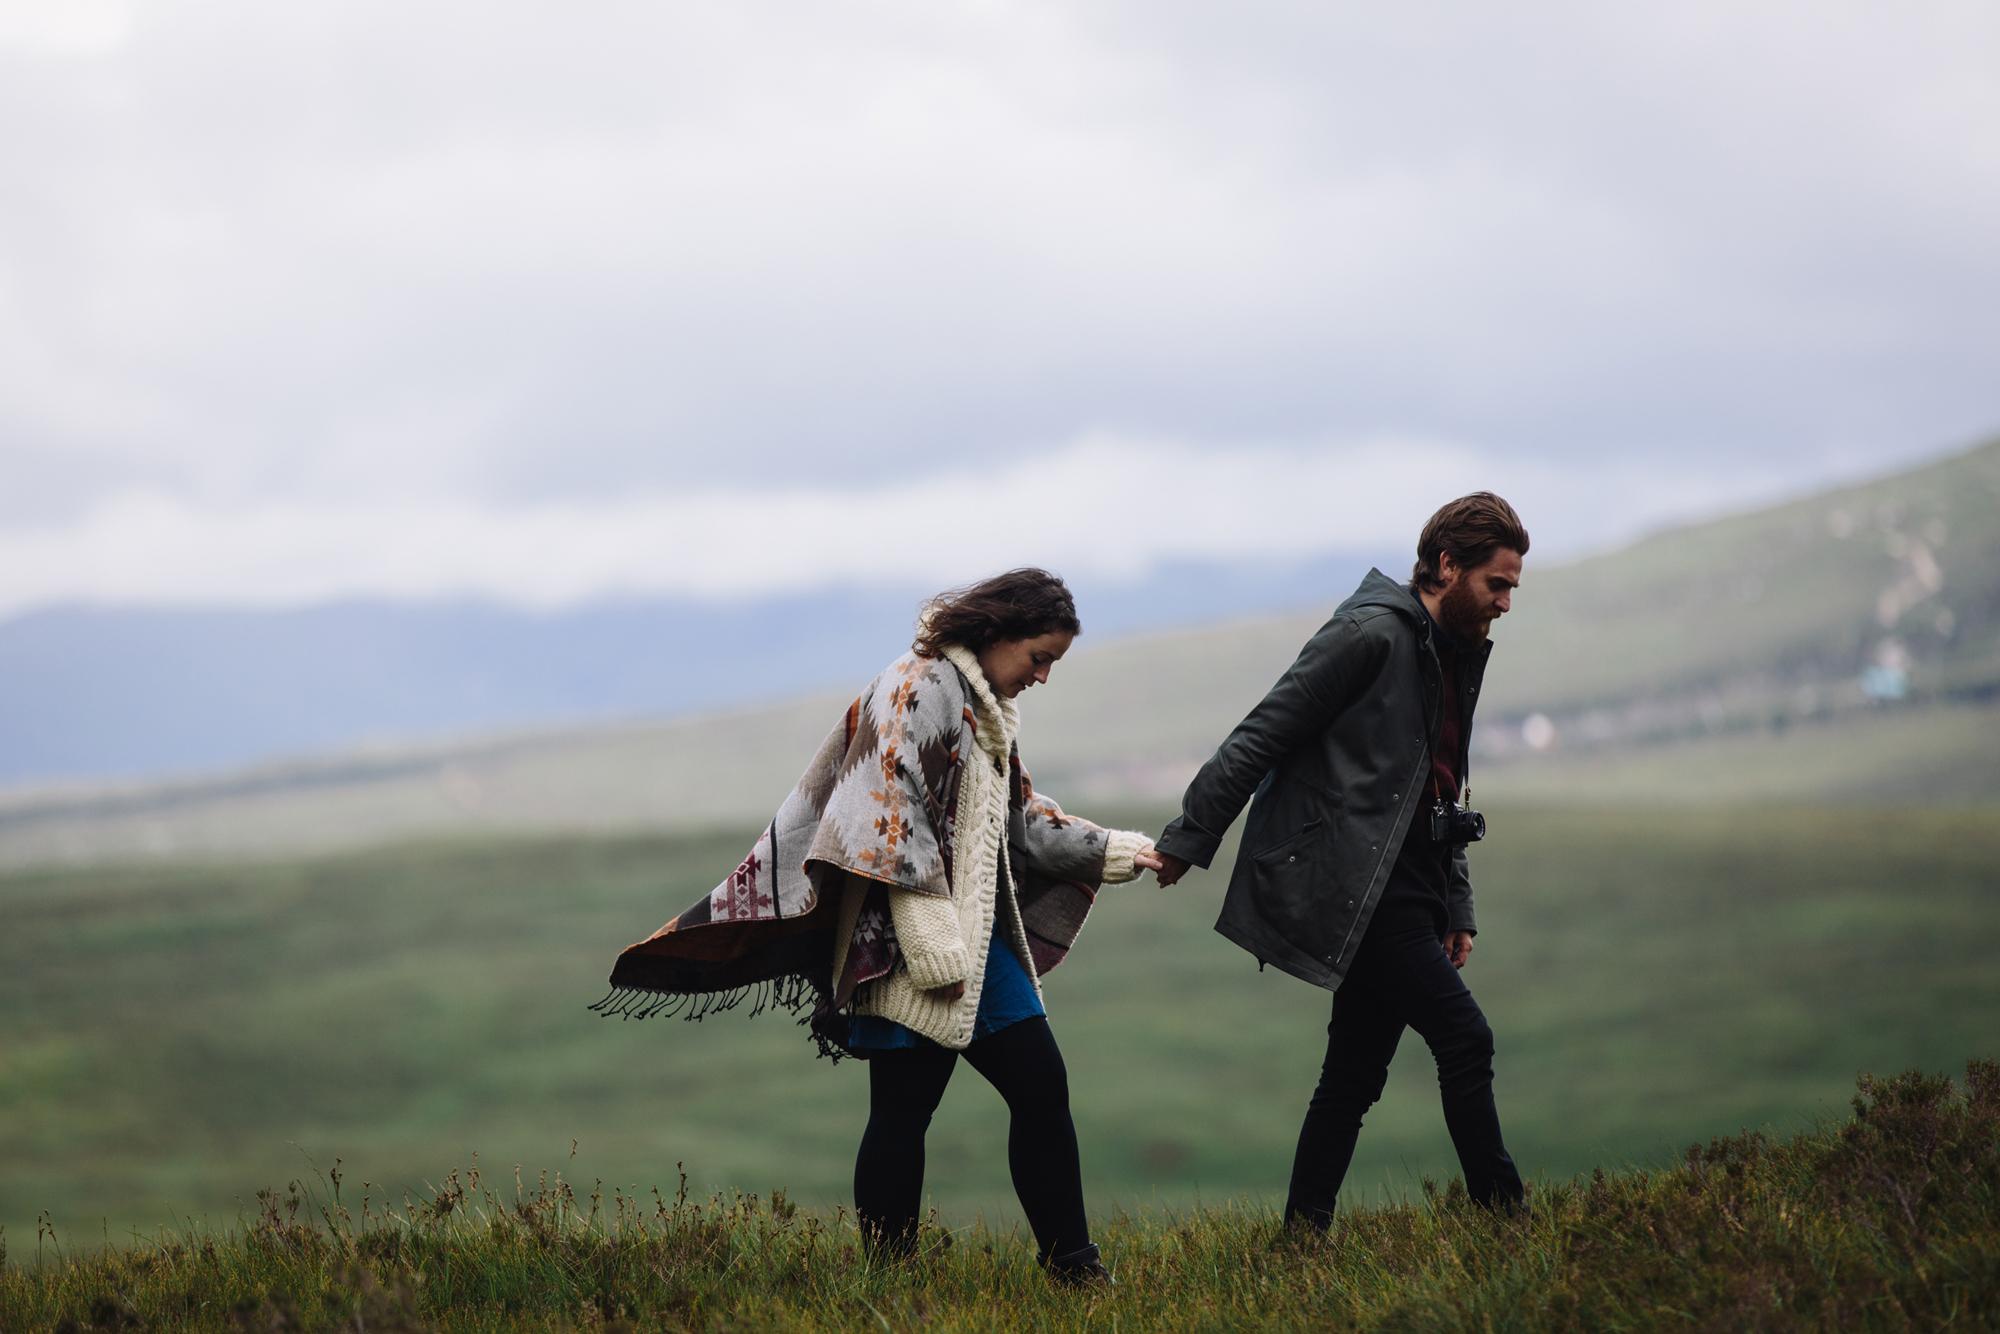 Hermione McCosh Photography - couple photoshoot in Glencoe, Scotland, scottish wedding photographer, creative and romantic portraits